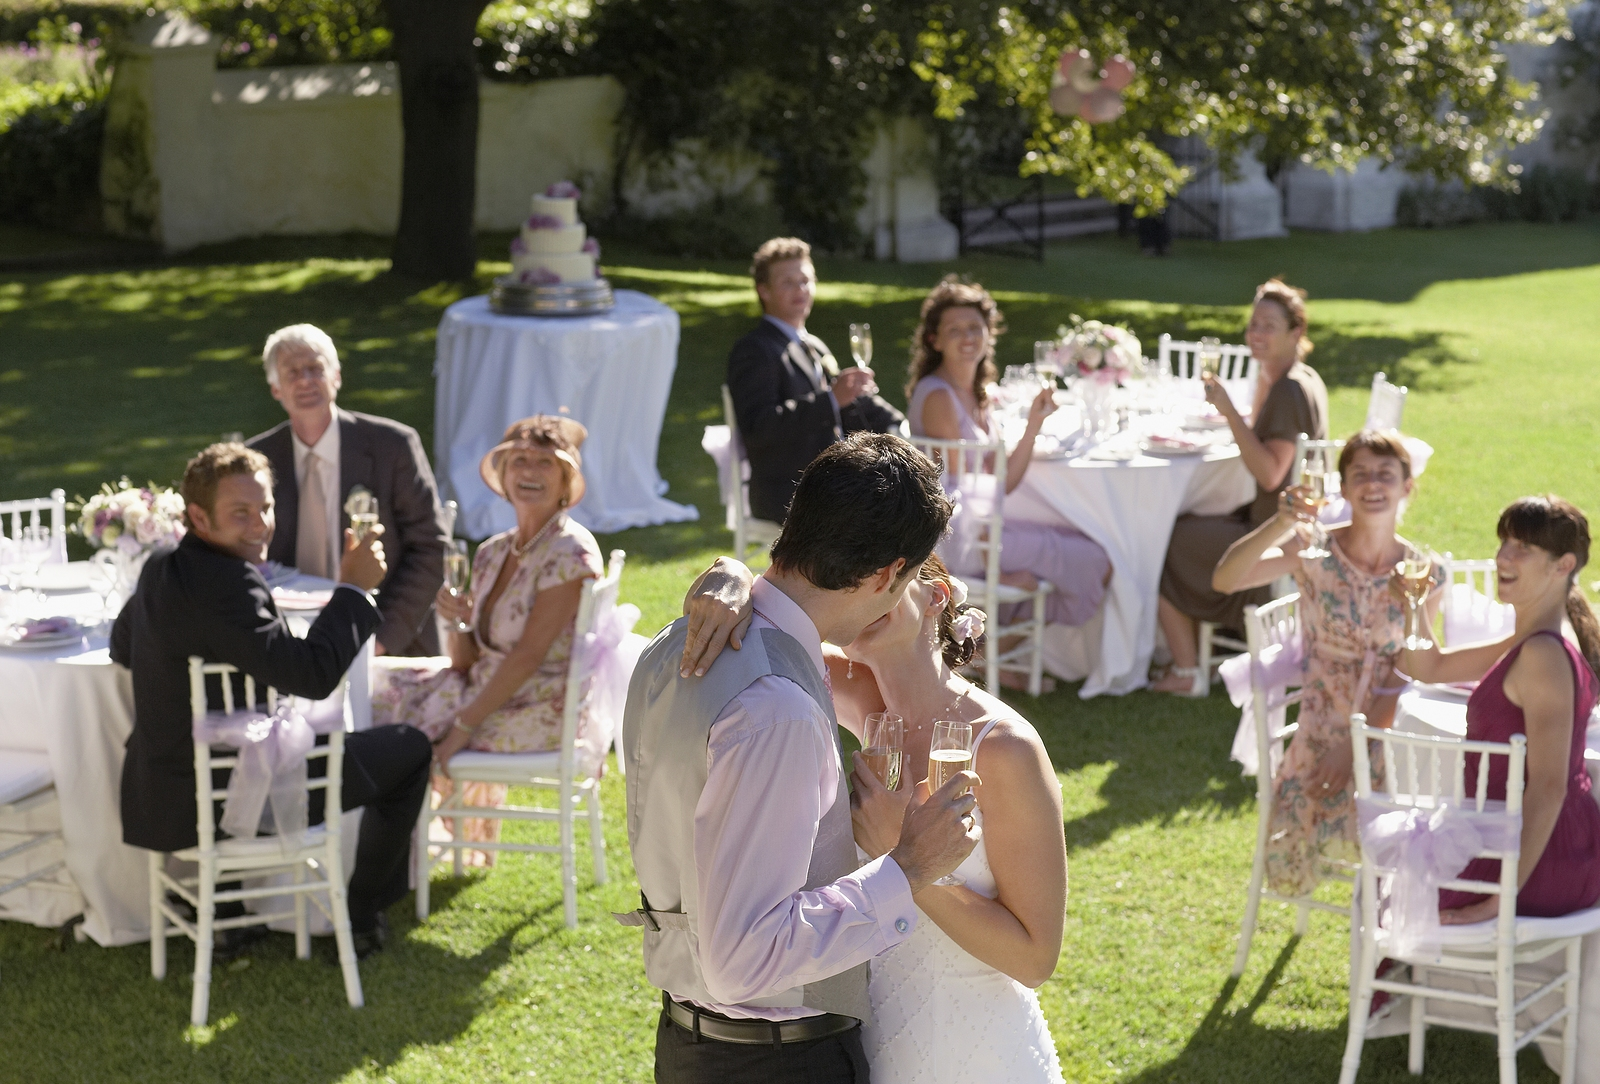 Wedding Entertainment in NJ - Perks of a Friday Wedding